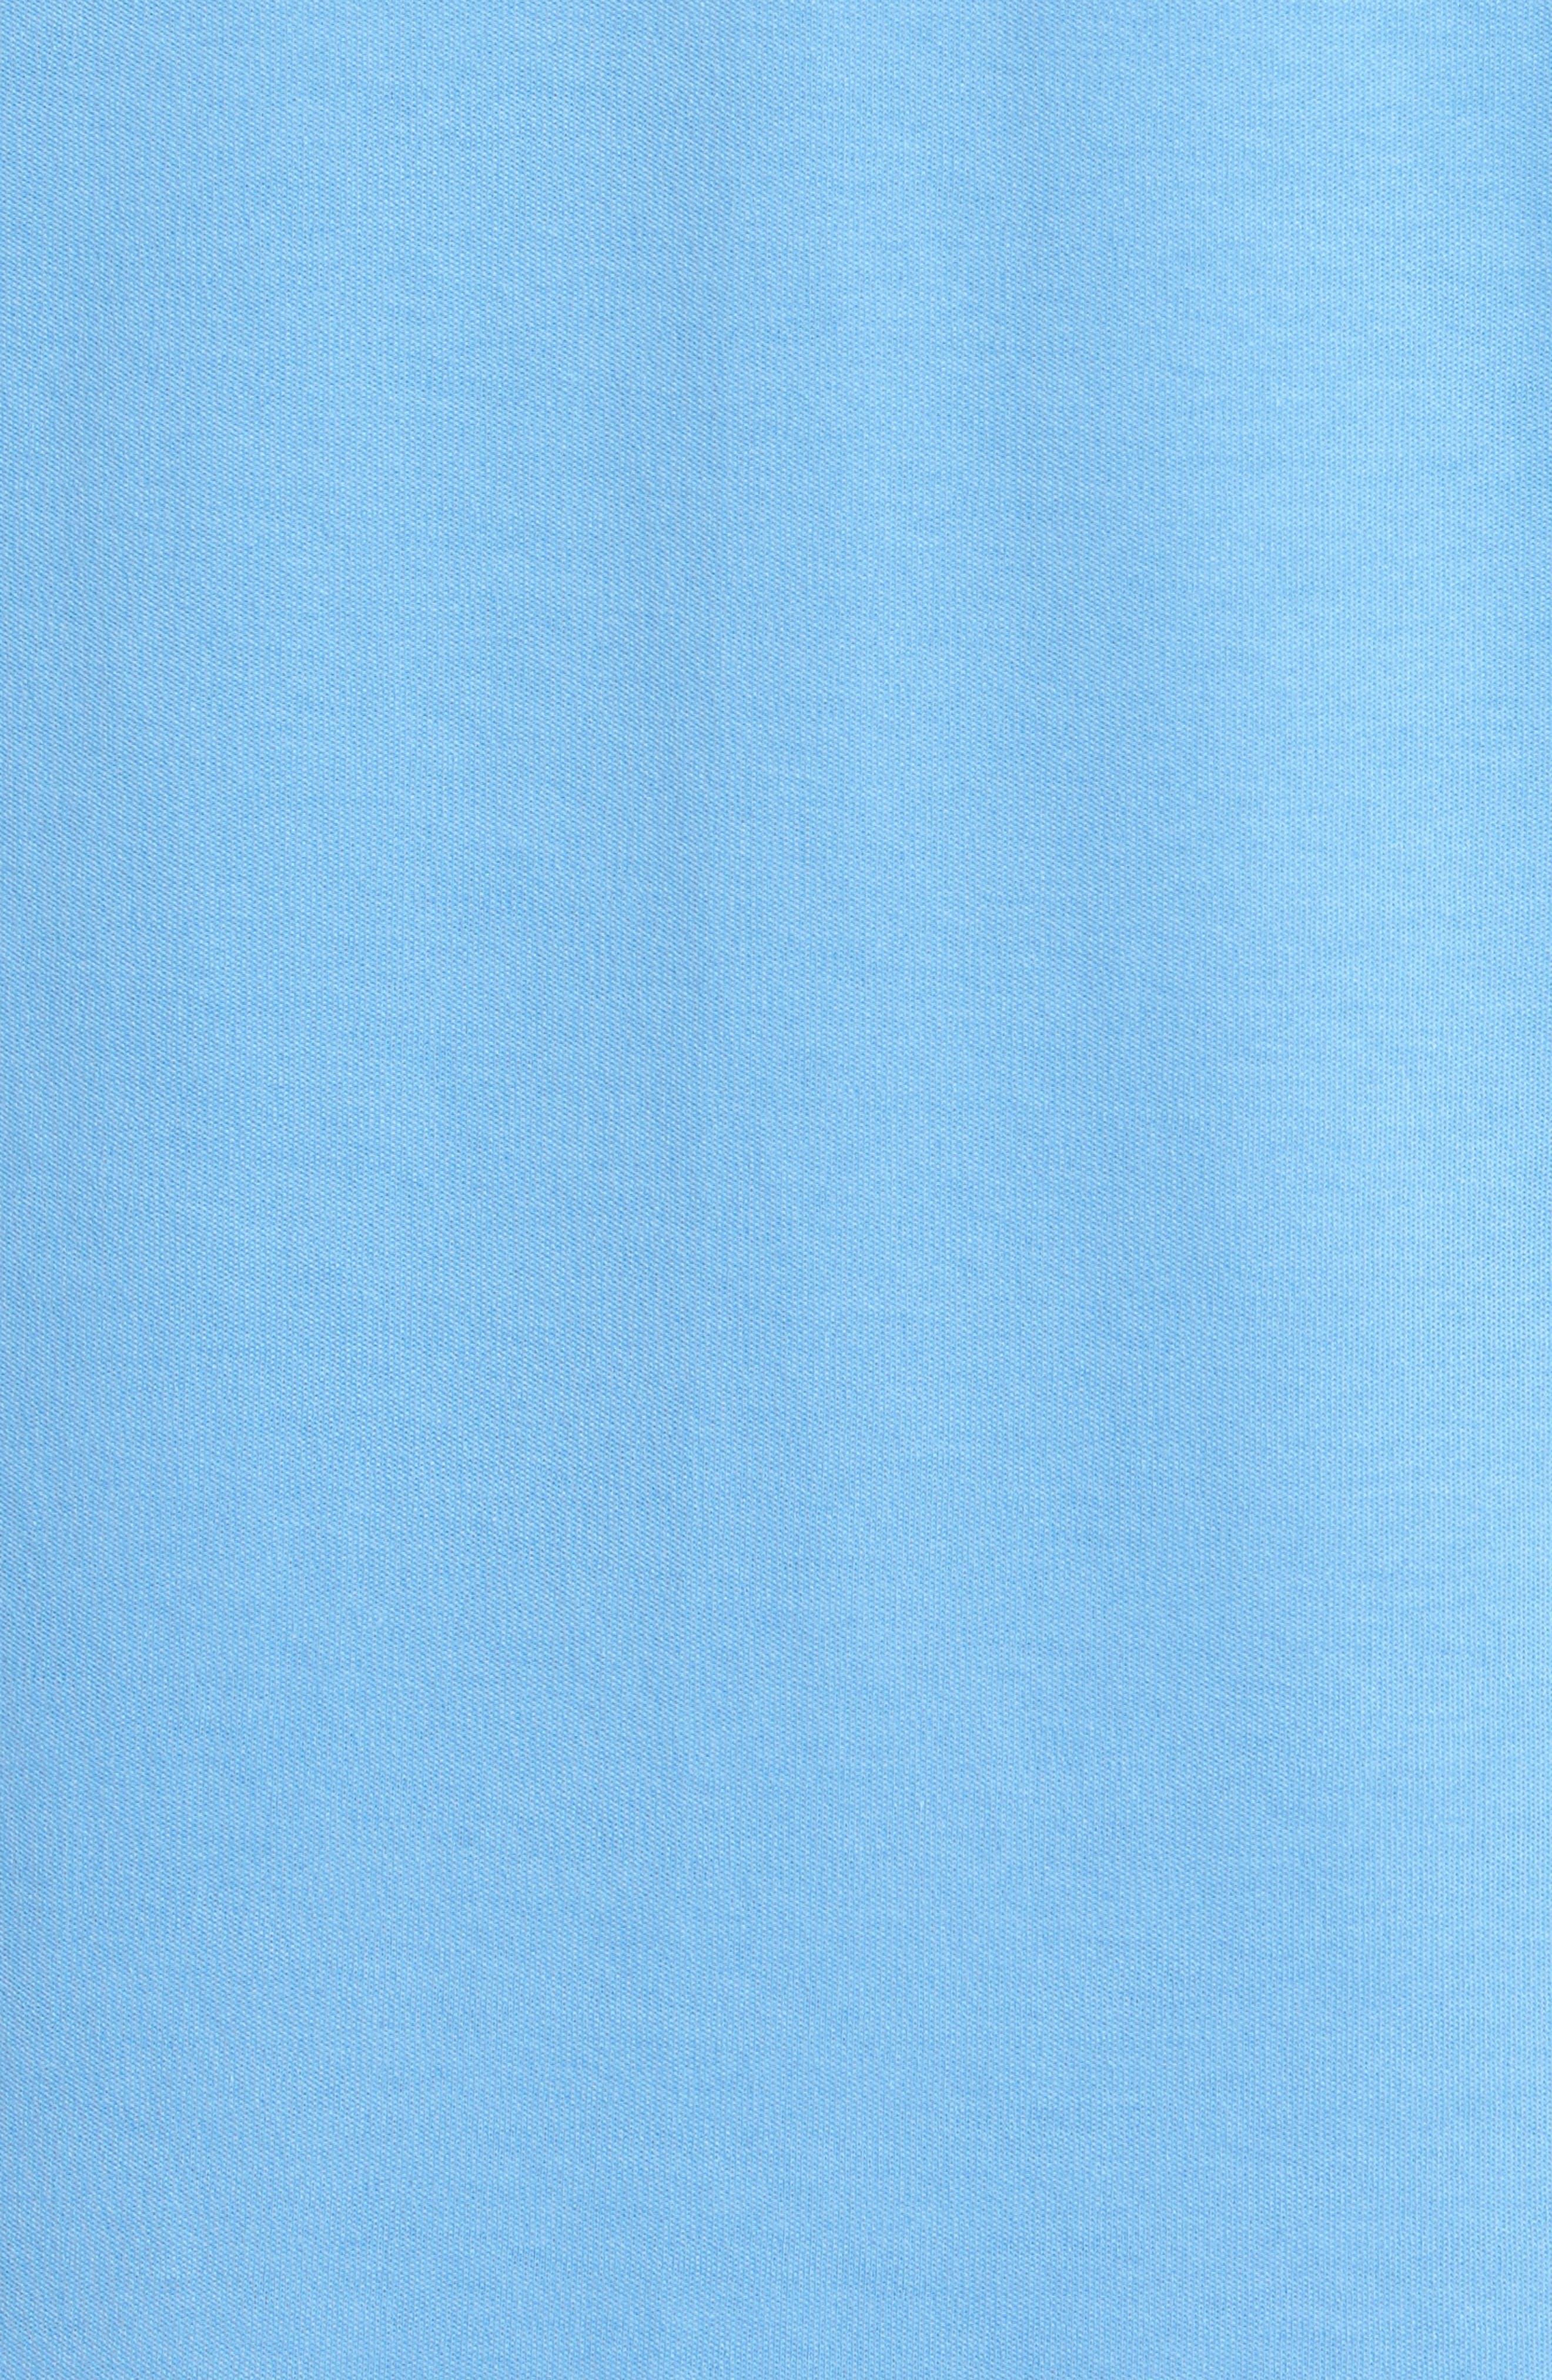 Denim Trim Polo,                             Alternate thumbnail 5, color,                             Light Blue